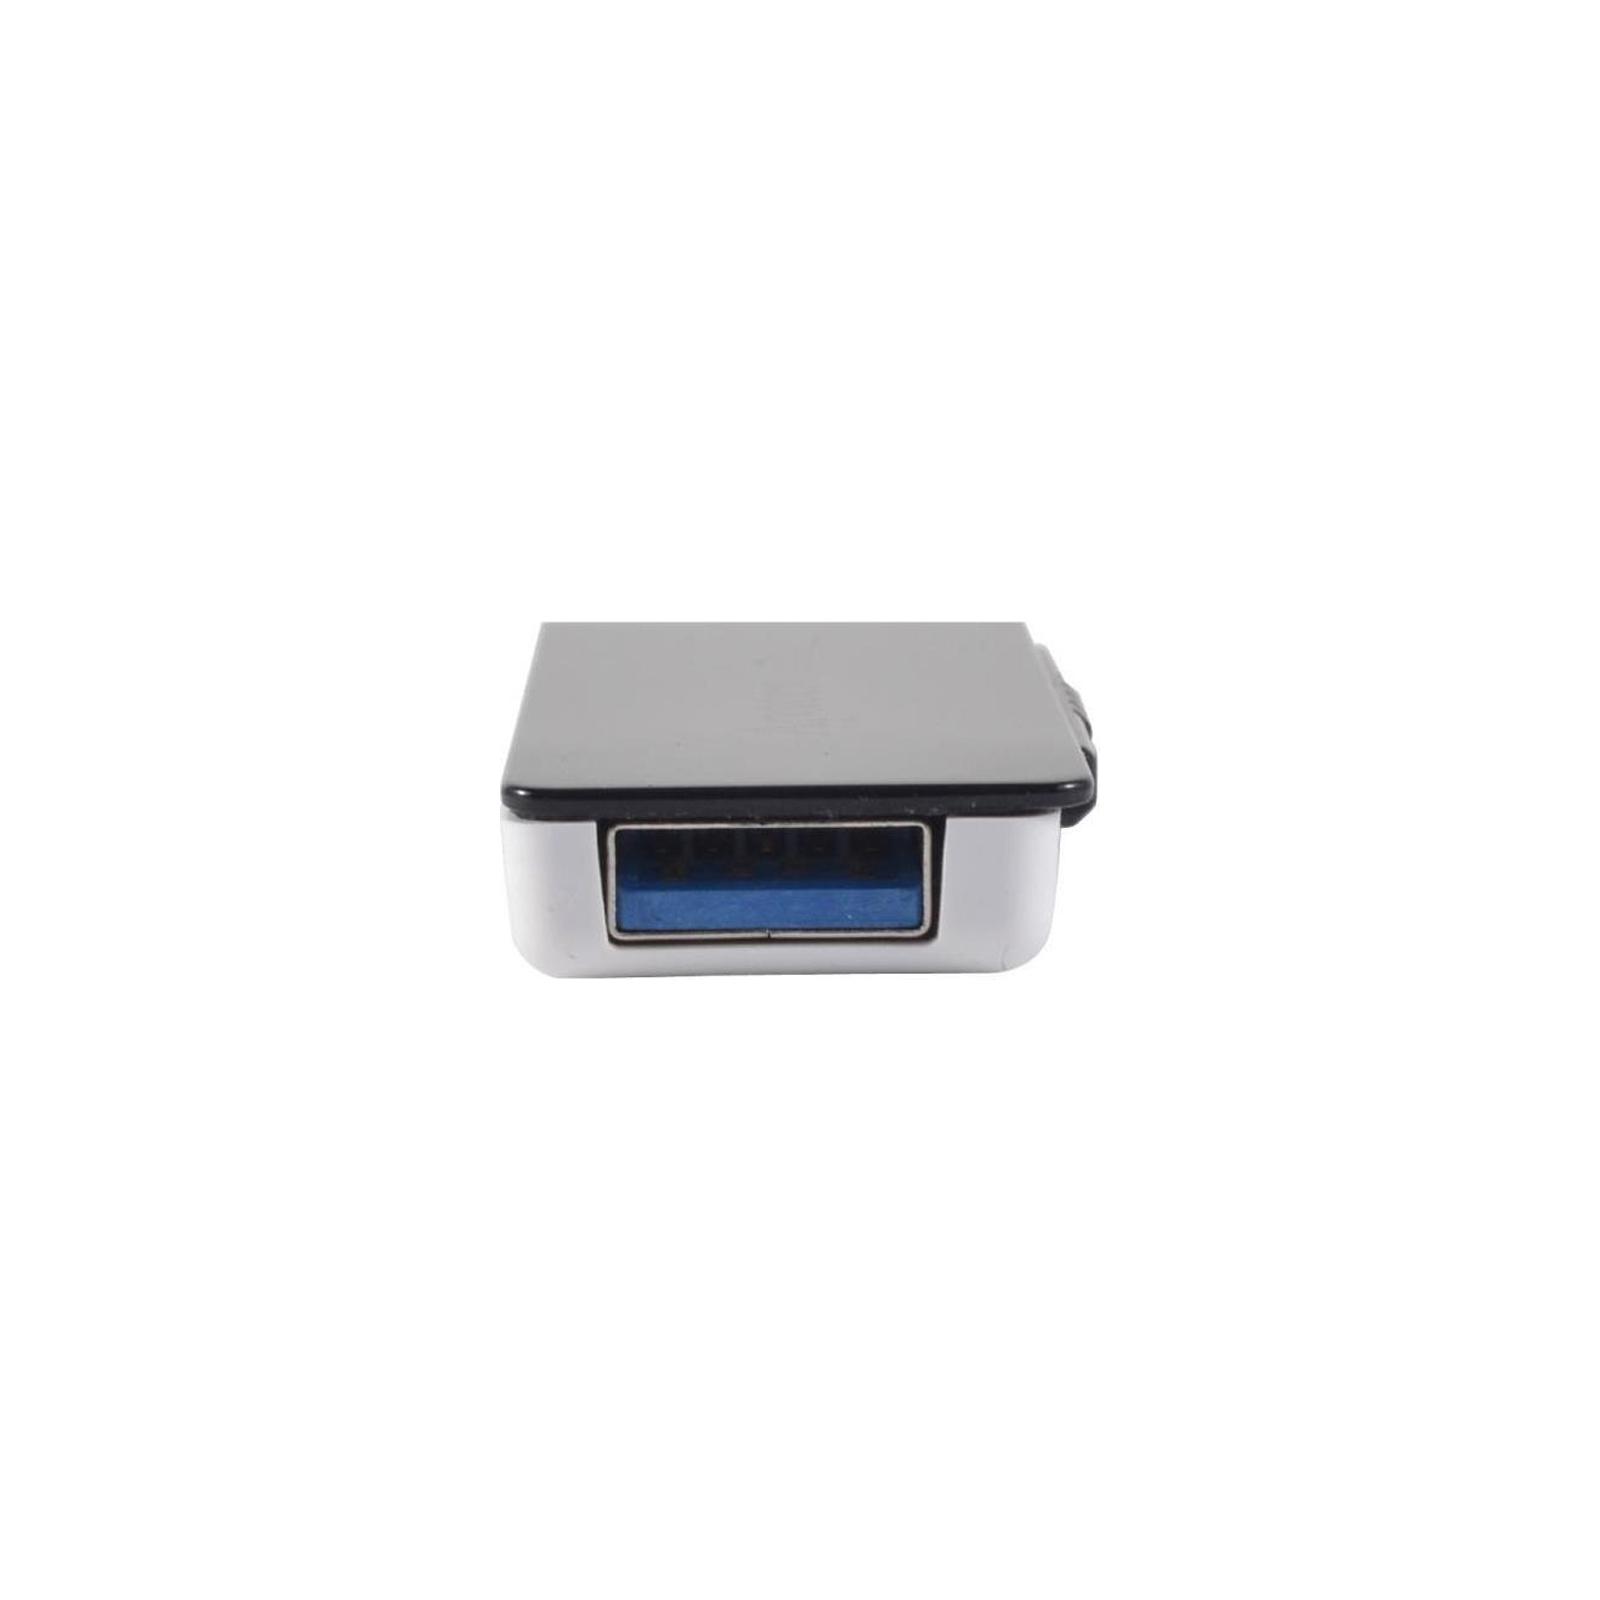 USB флеш накопитель 32GB AH350 Black RP USB3.0 Apacer (AP32GAH350B-1) изображение 7